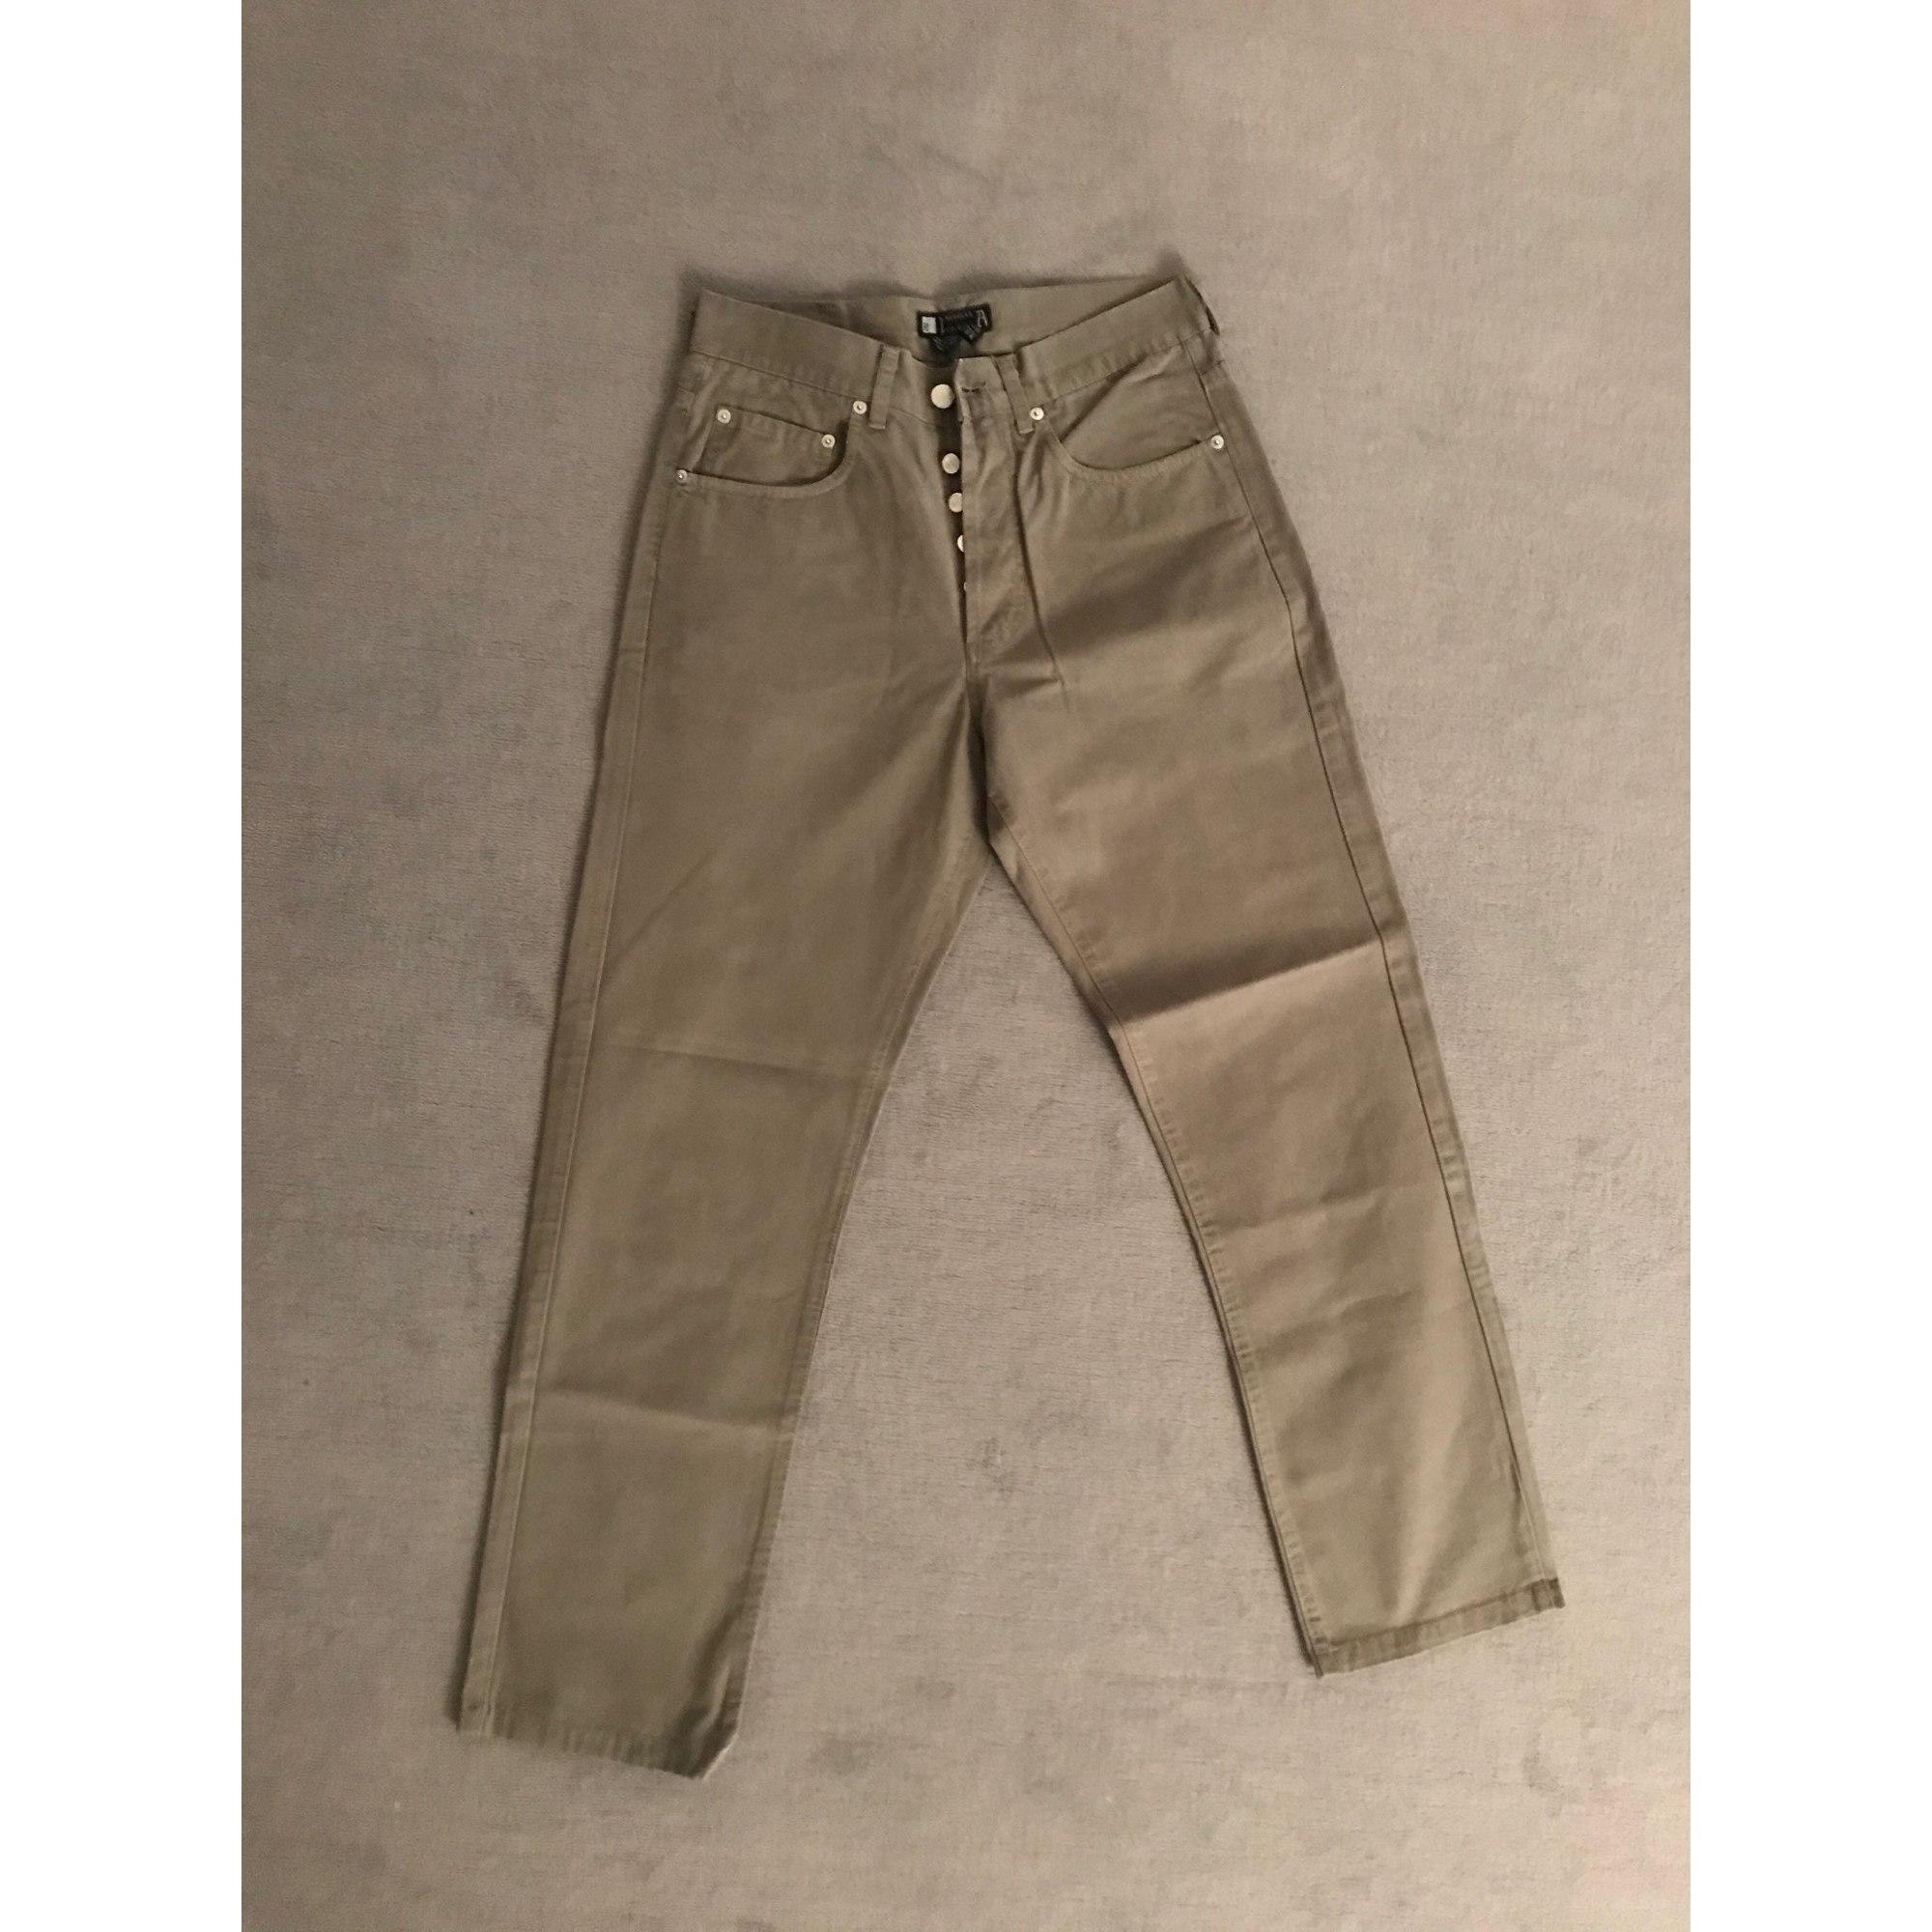 Jeans droit ZARA Kaki